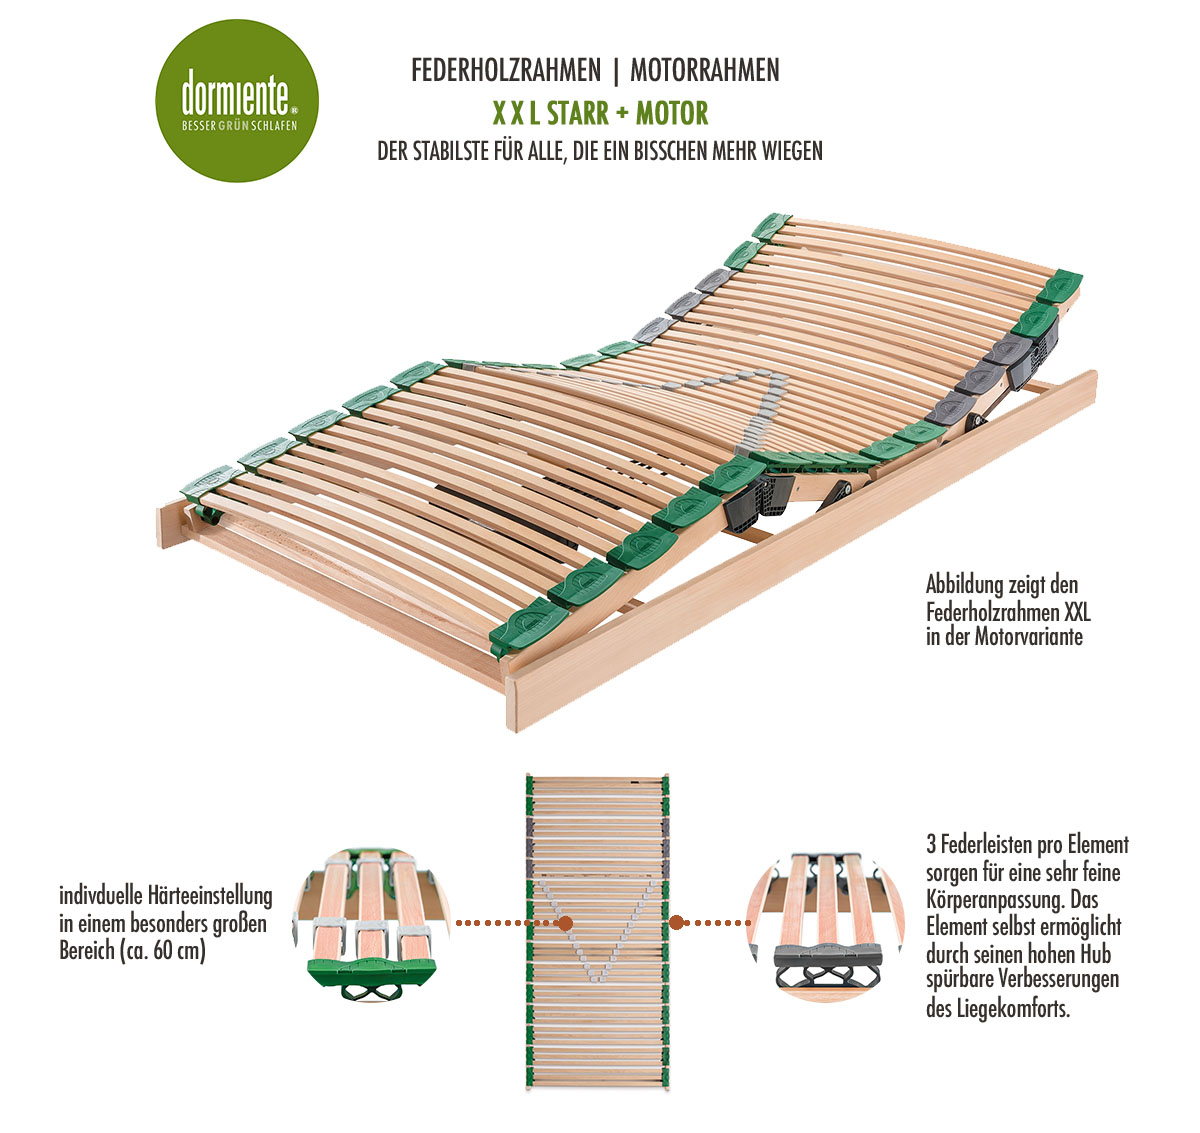 Dormiente-Federholzrahmen-XXL-Starr-und-Motor-Eigenschaften_gross